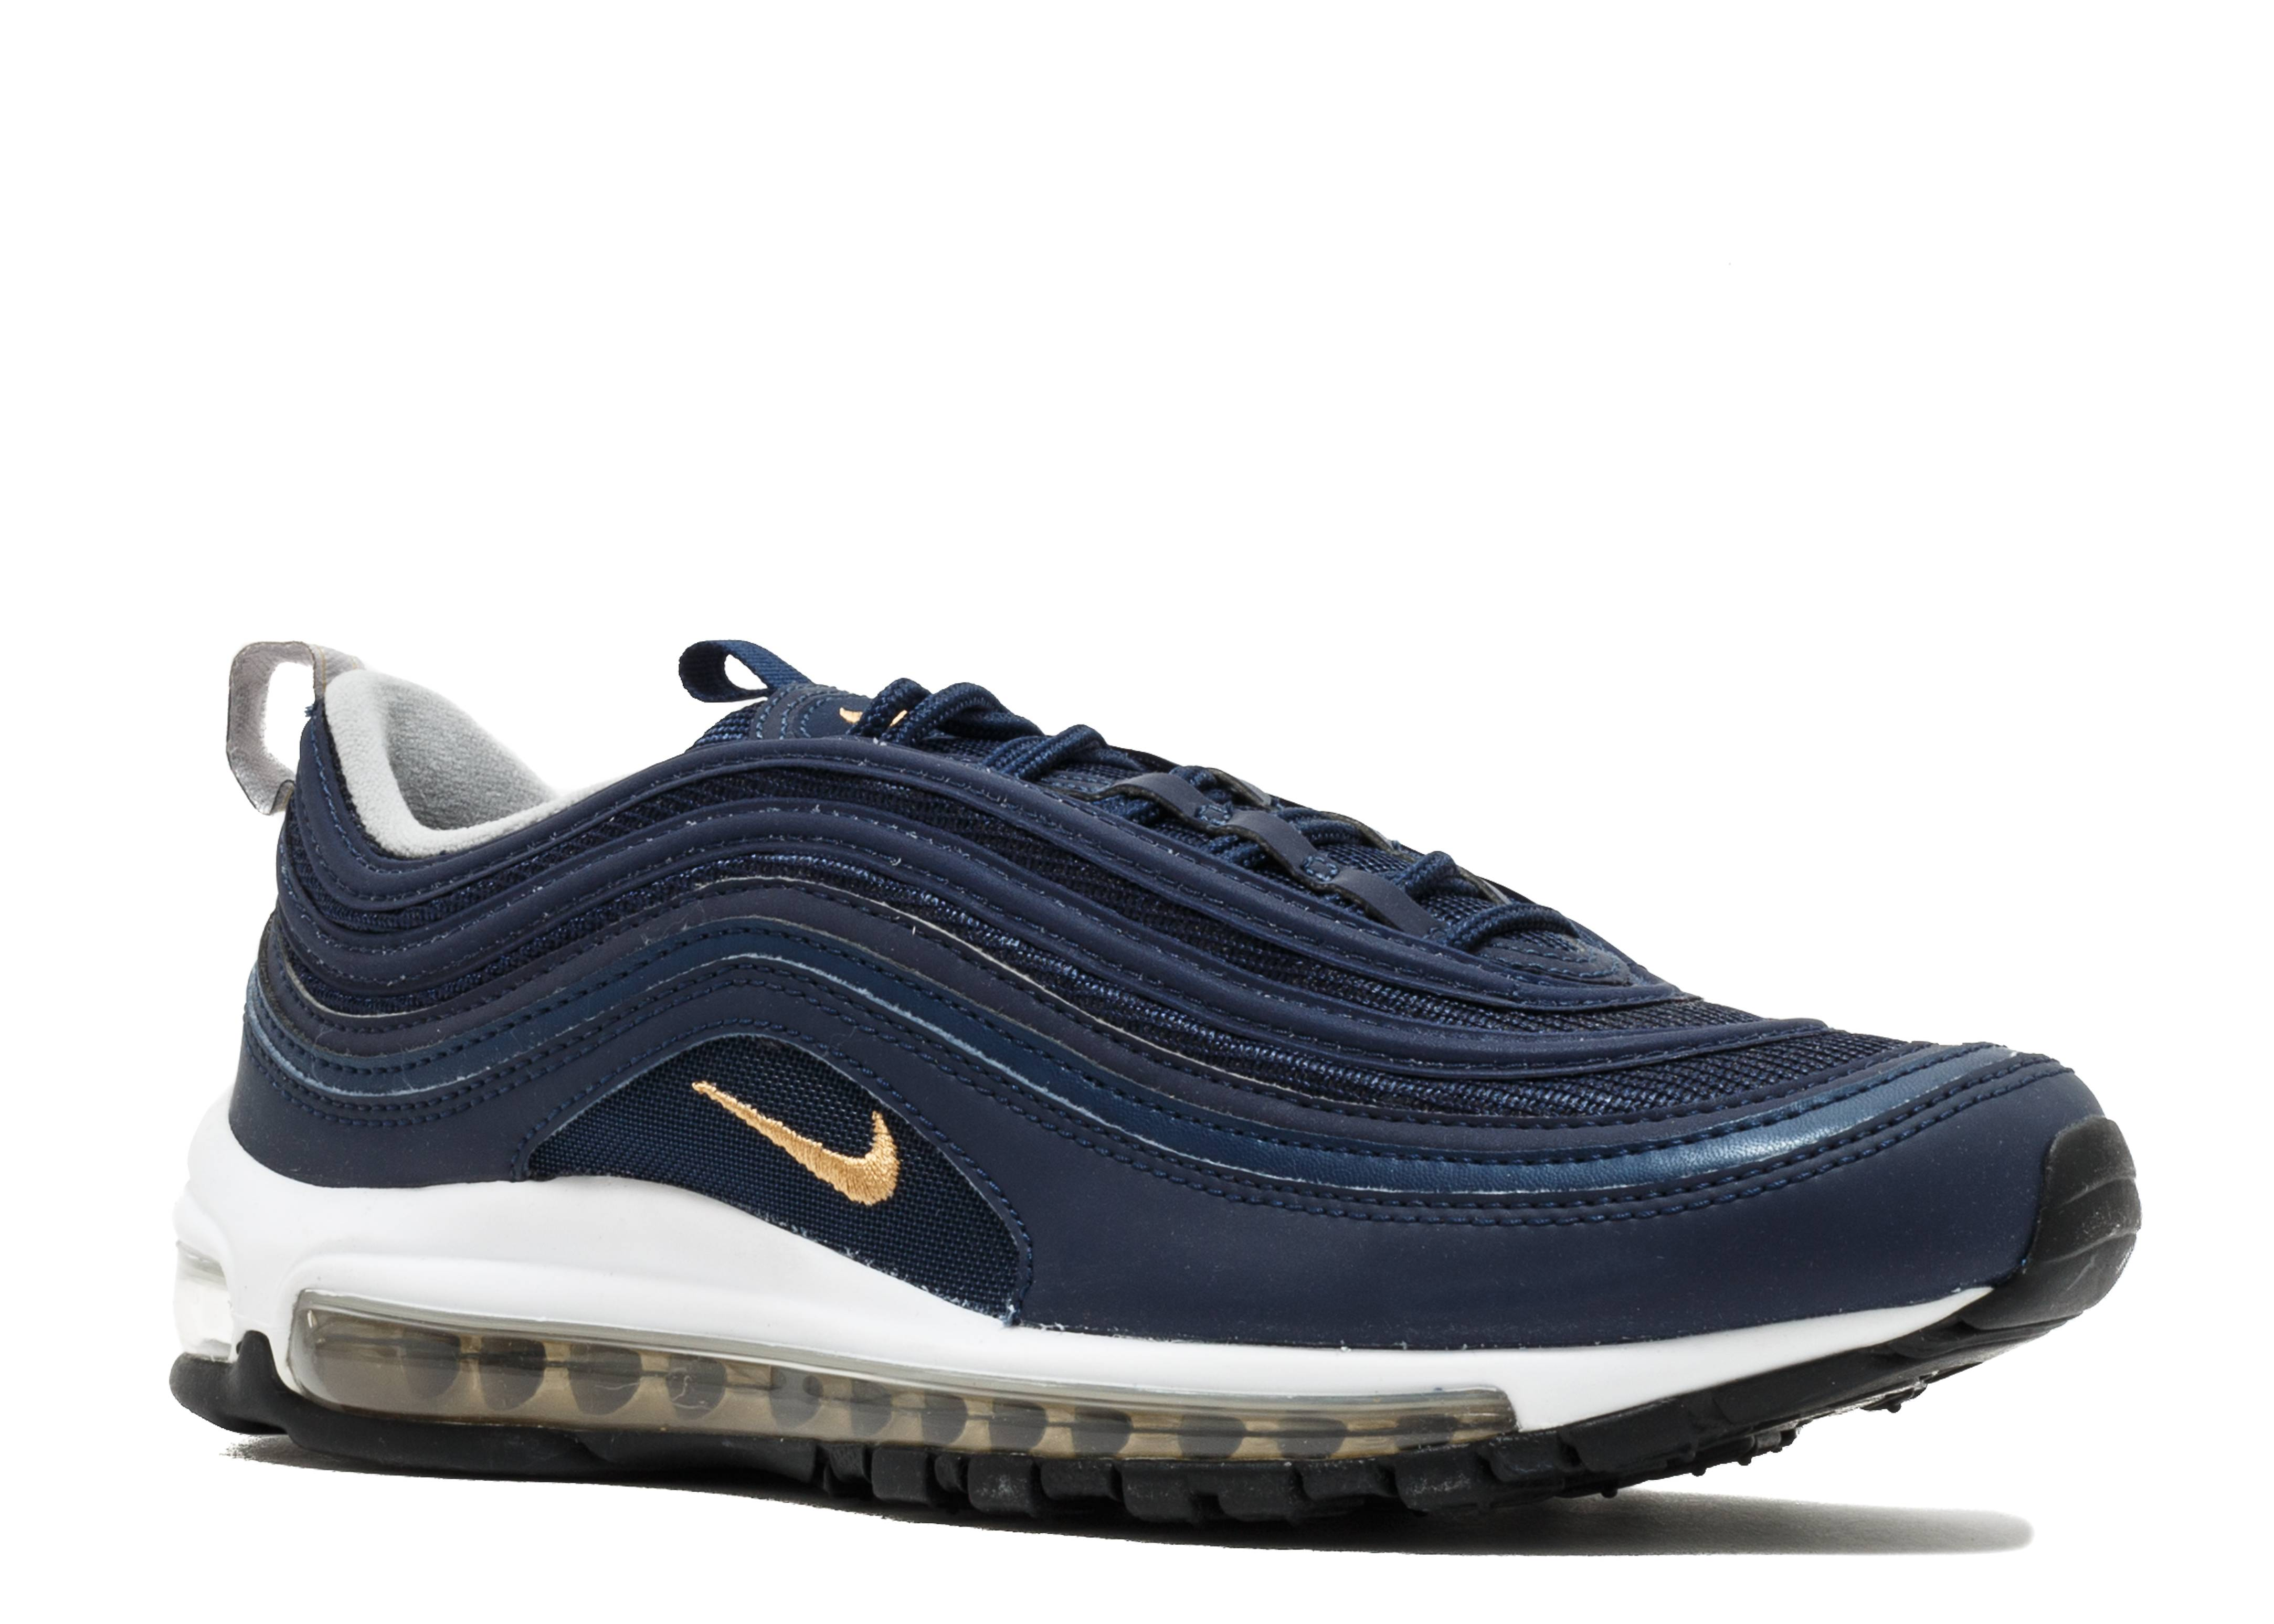 brand new 8c8de 66456 Nike Air Max 97